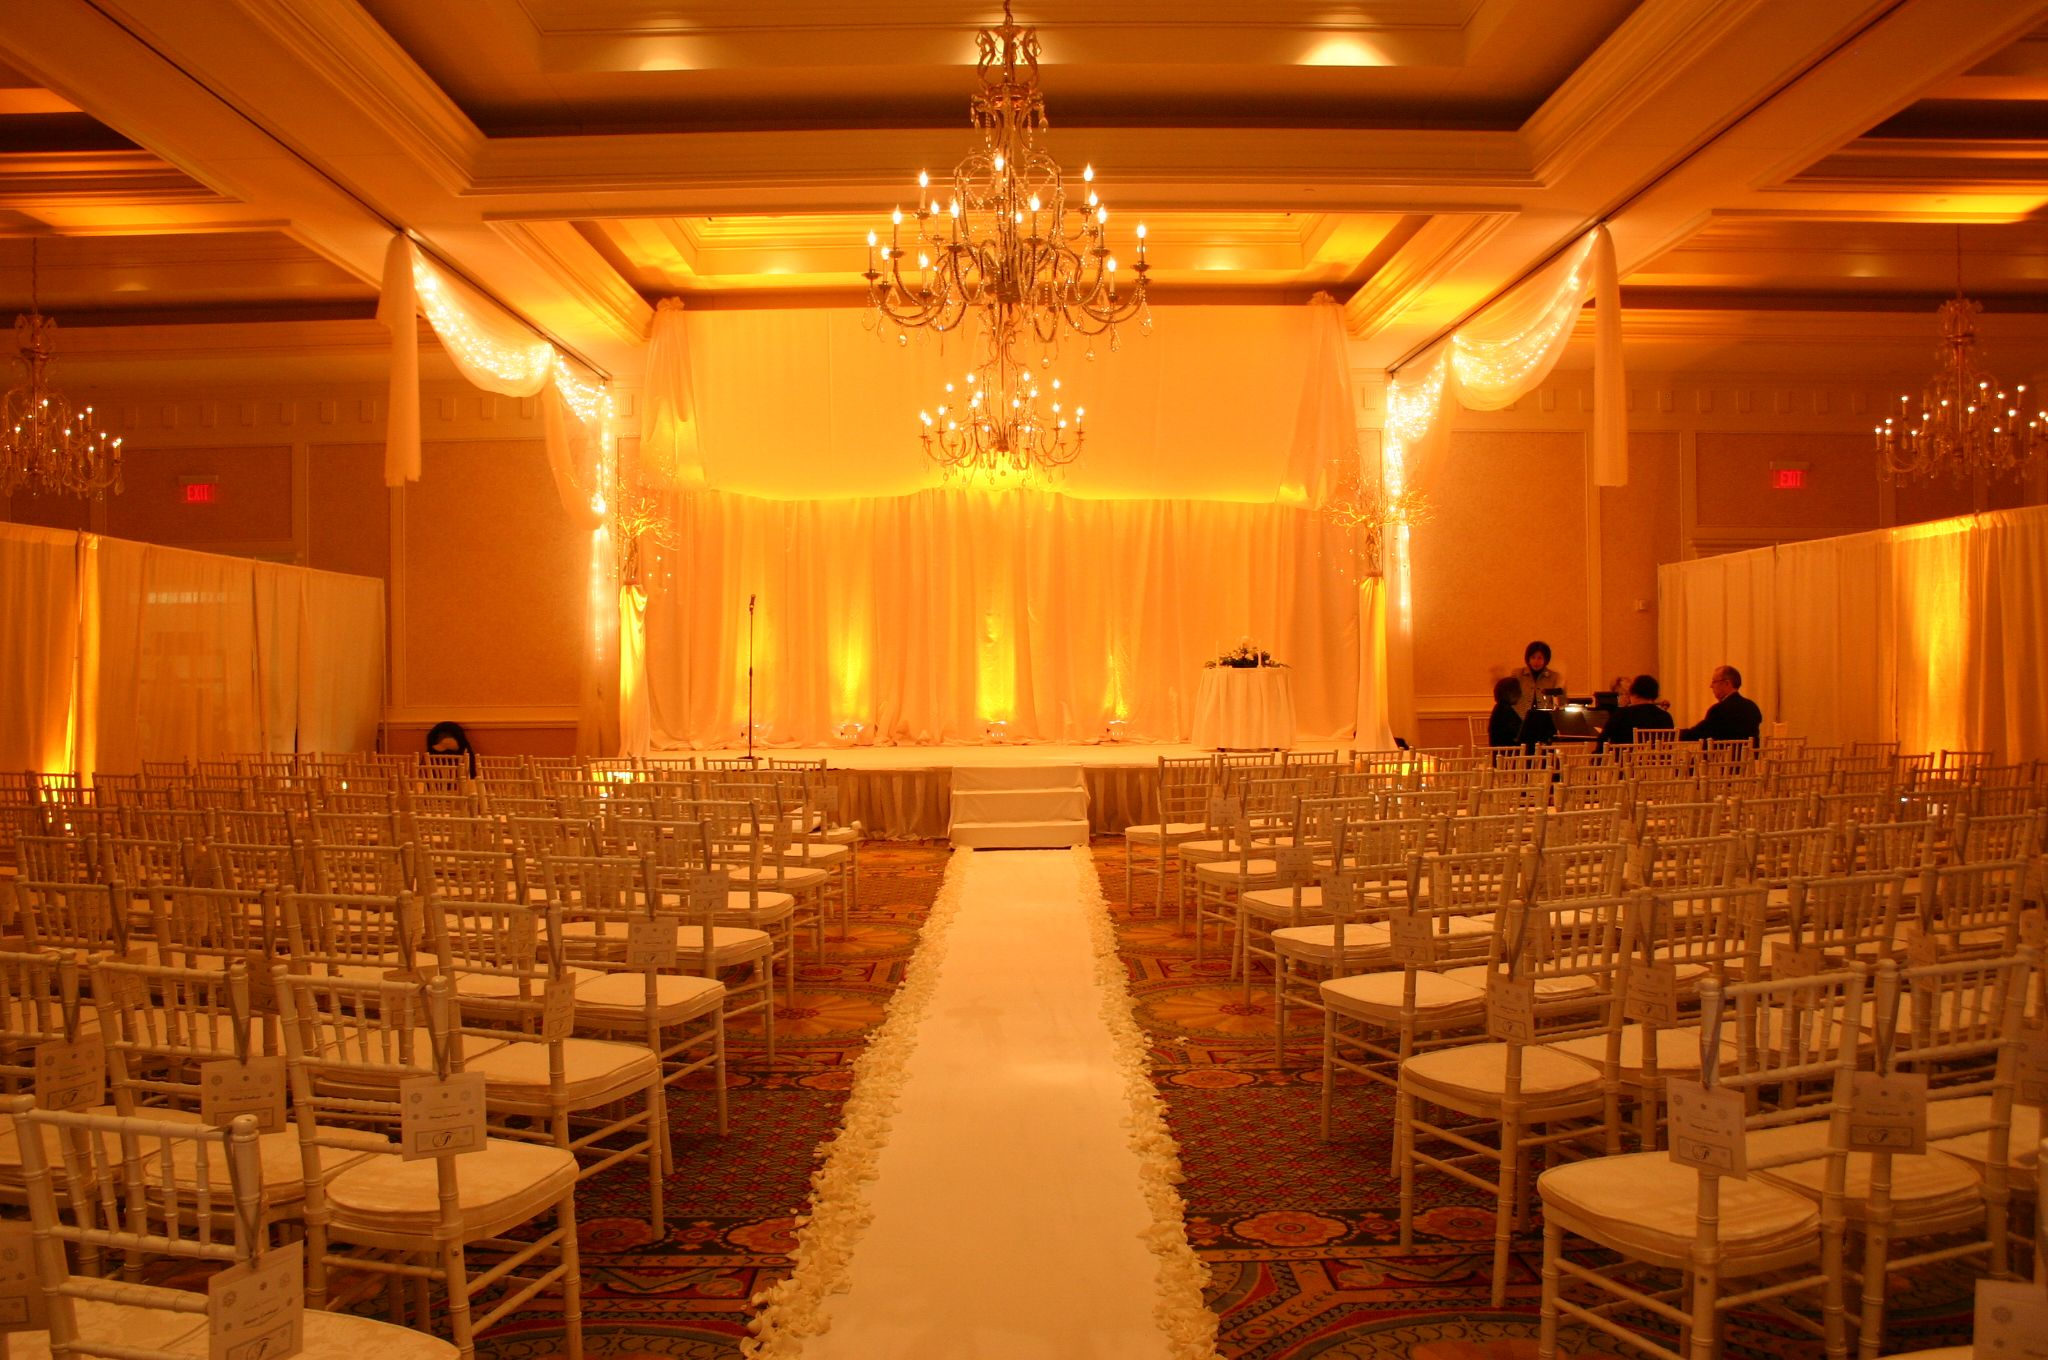 regent ballroom wedding design at the hilton columbus at. Black Bedroom Furniture Sets. Home Design Ideas